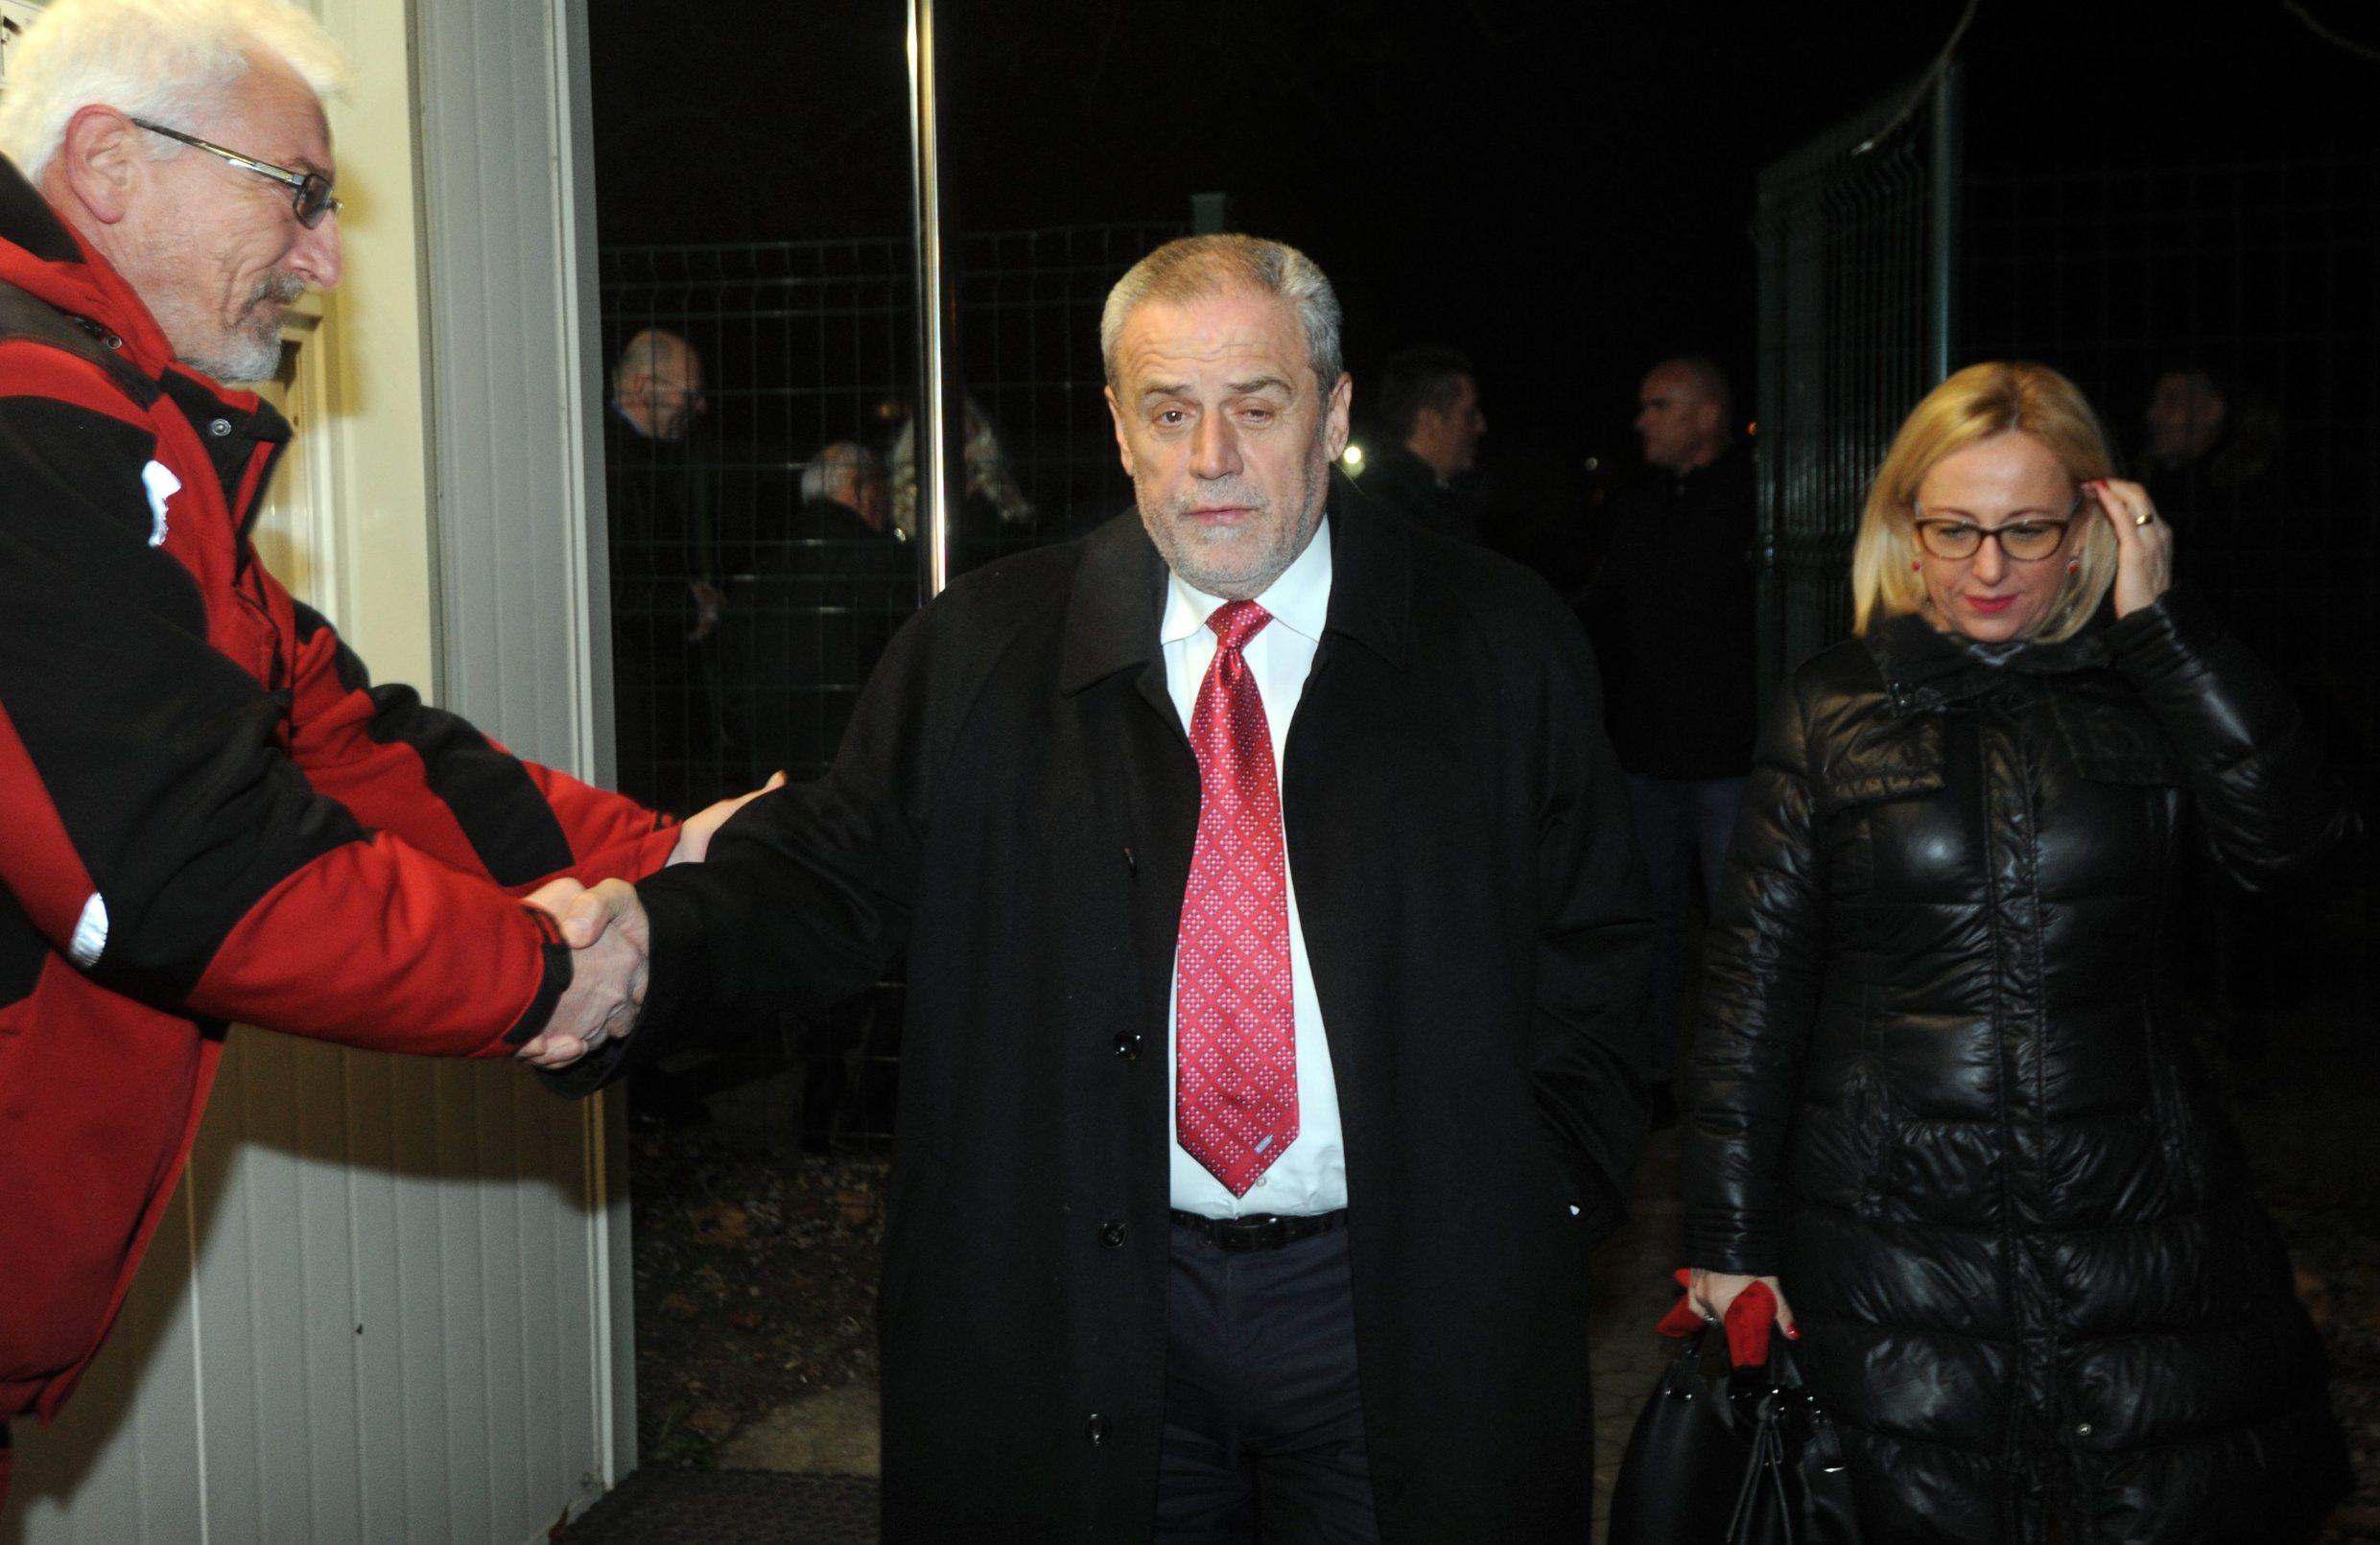 Milan Bandić s beskućnicima u Kosnici